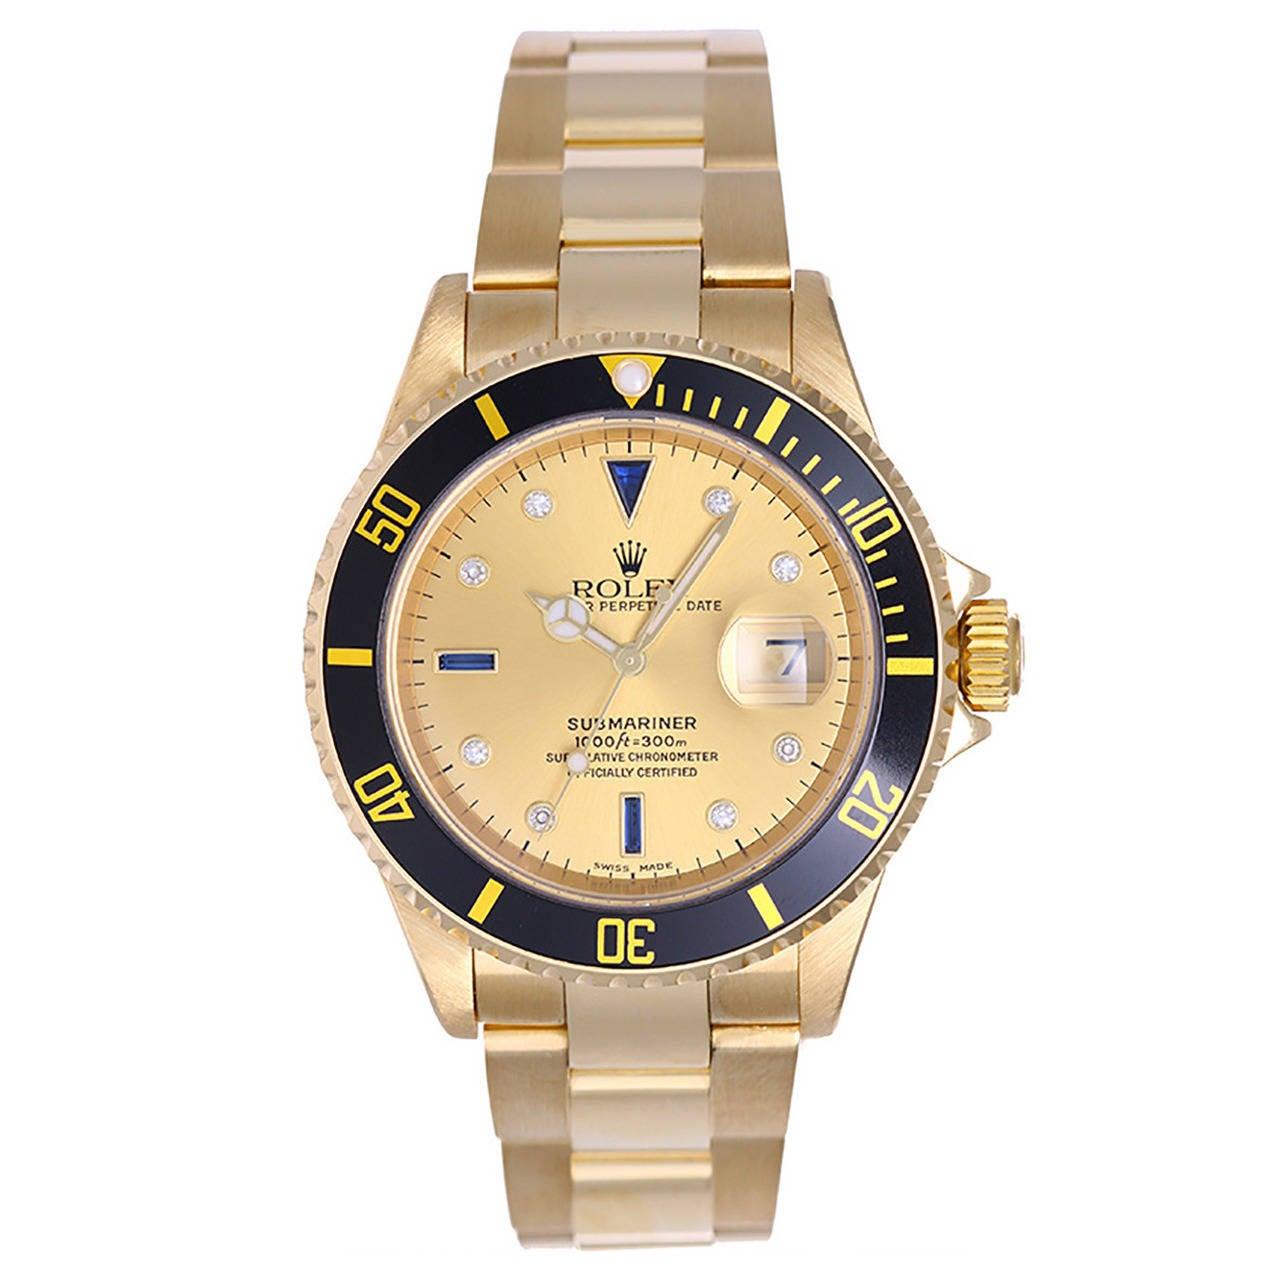 Rolex Submariner Diamond Dial For Sale